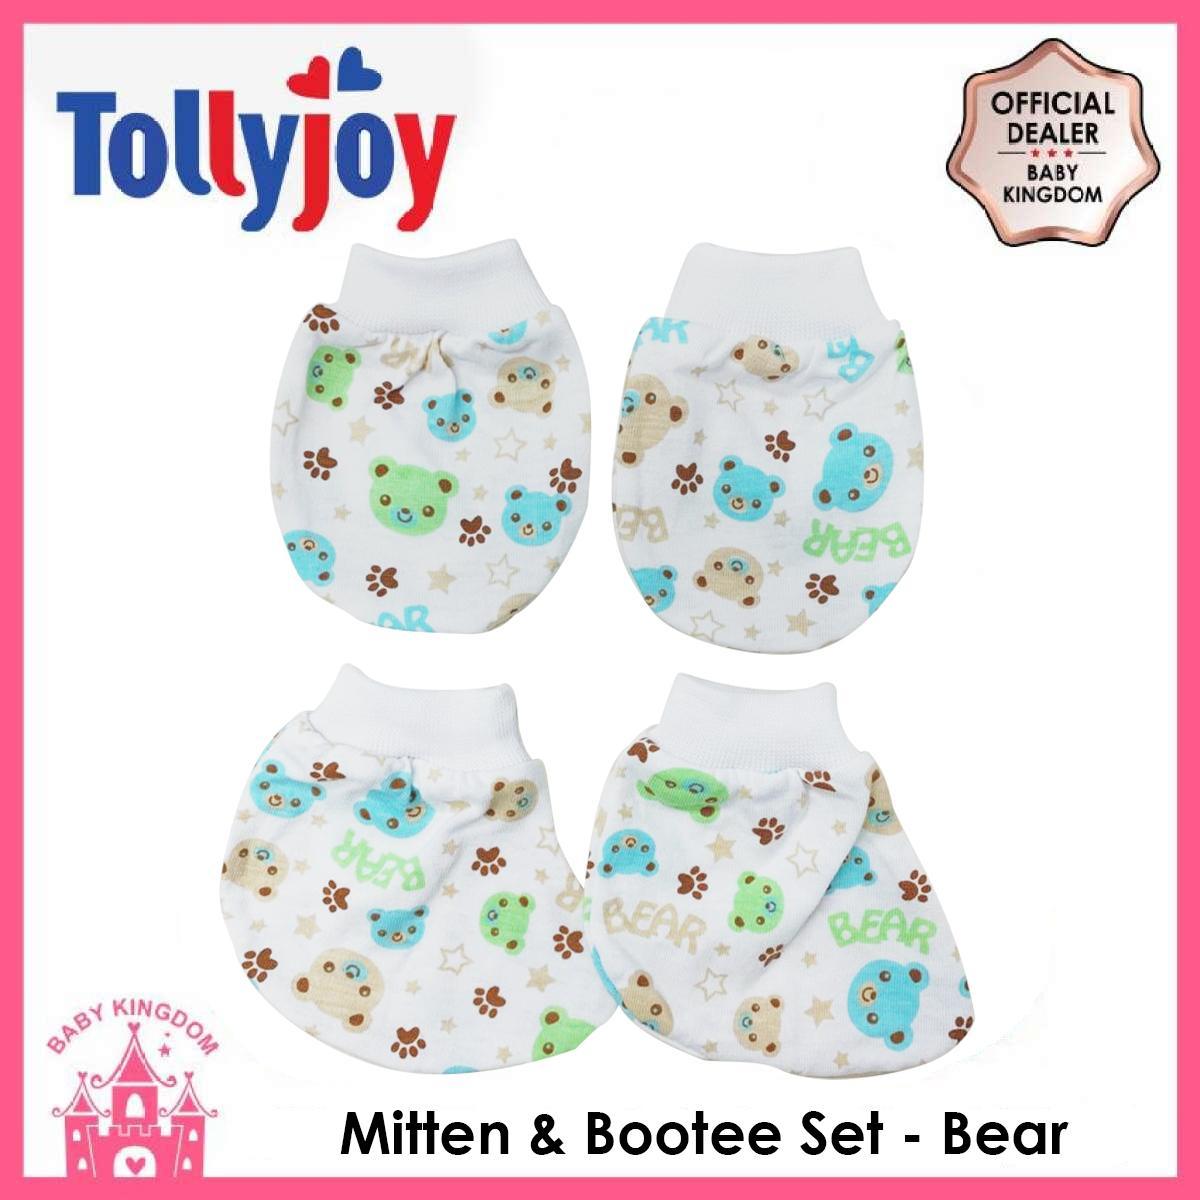 Boys' Baby Clothing Infant Baby Boys Girls Winter Warm Gloves Newborn Mittens Amazing Cute Cartoon Thicken Warm Fleece Protector Gloves 0-12 Month